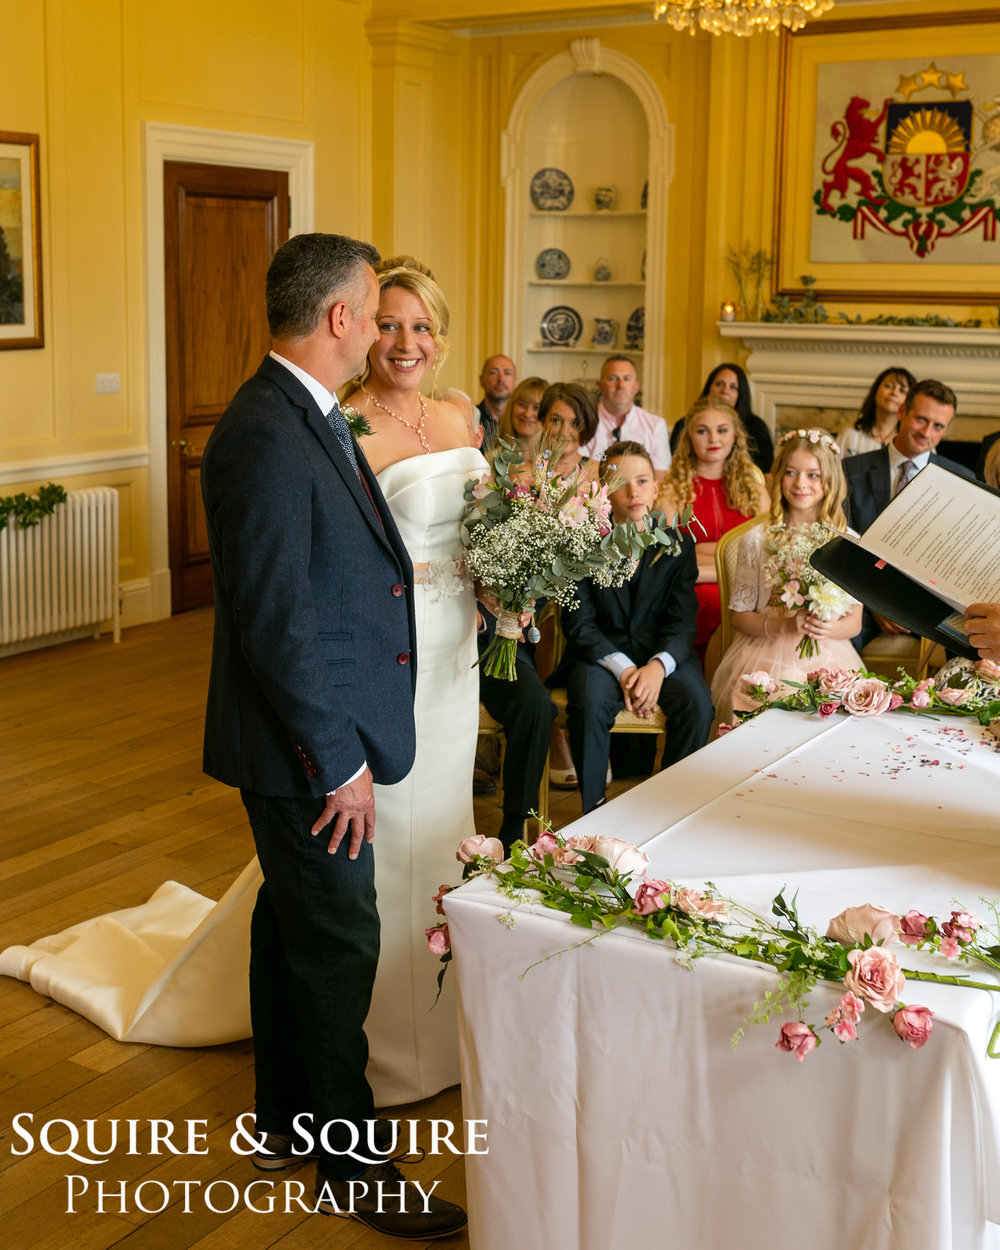 wedding_photography_catthorpe Manor (31 of 66).jpg